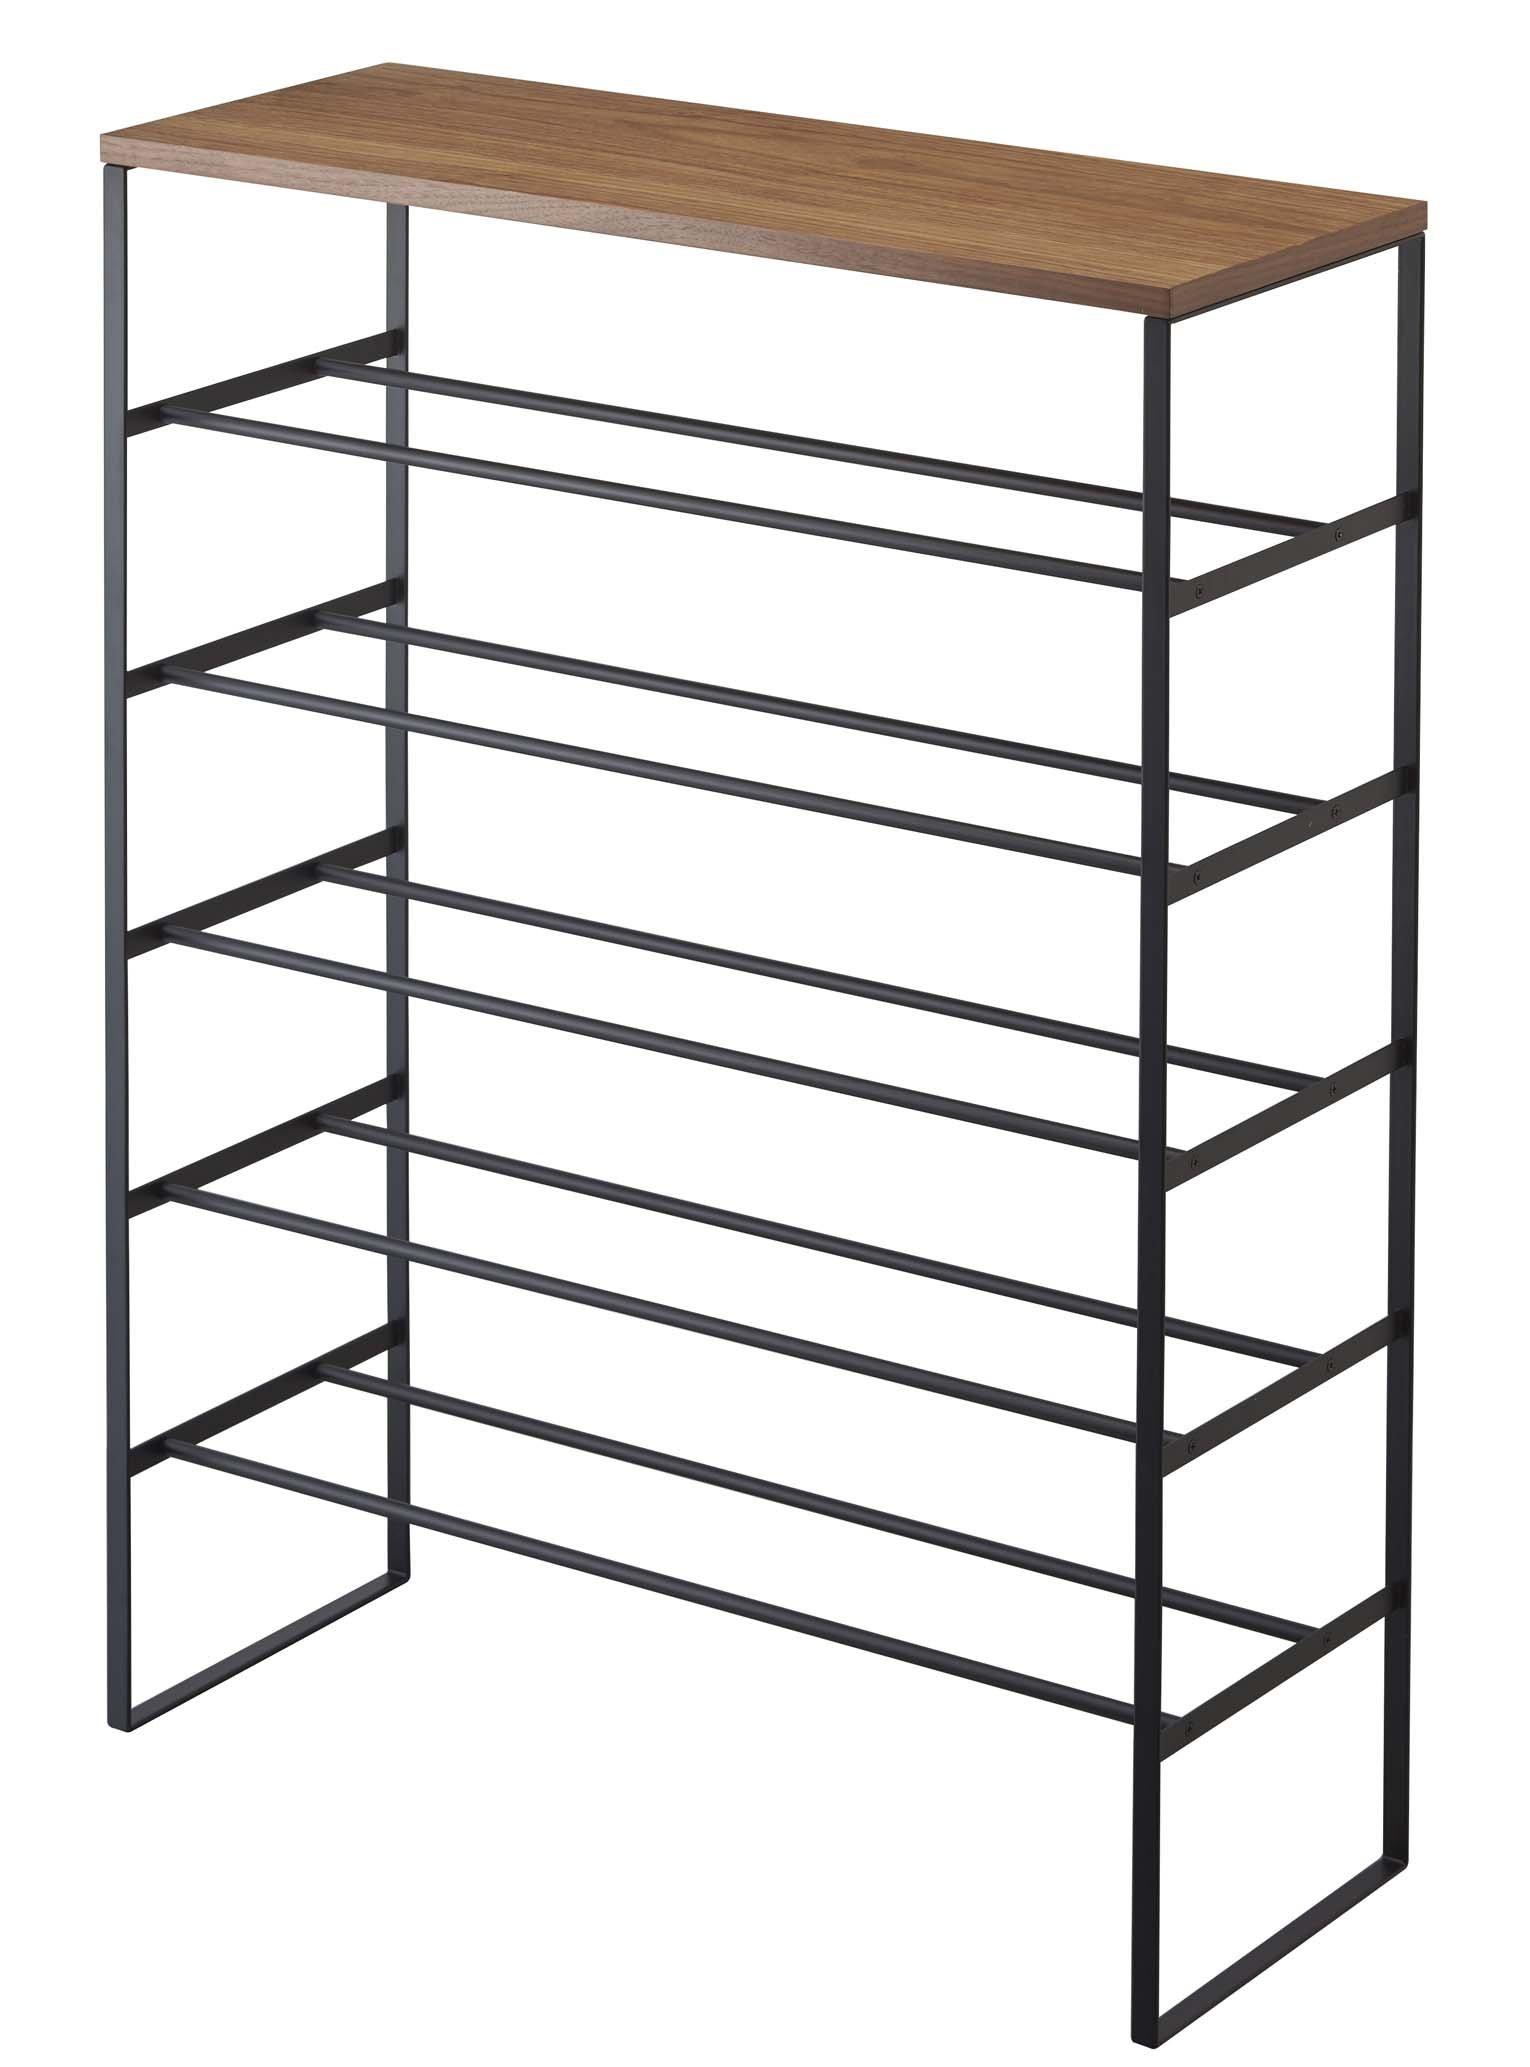 Modern Large Metal Tower Shoe Rack, Free Standing, Six Storage Shelves, Wooden Top Shelf, Black, 34-inch